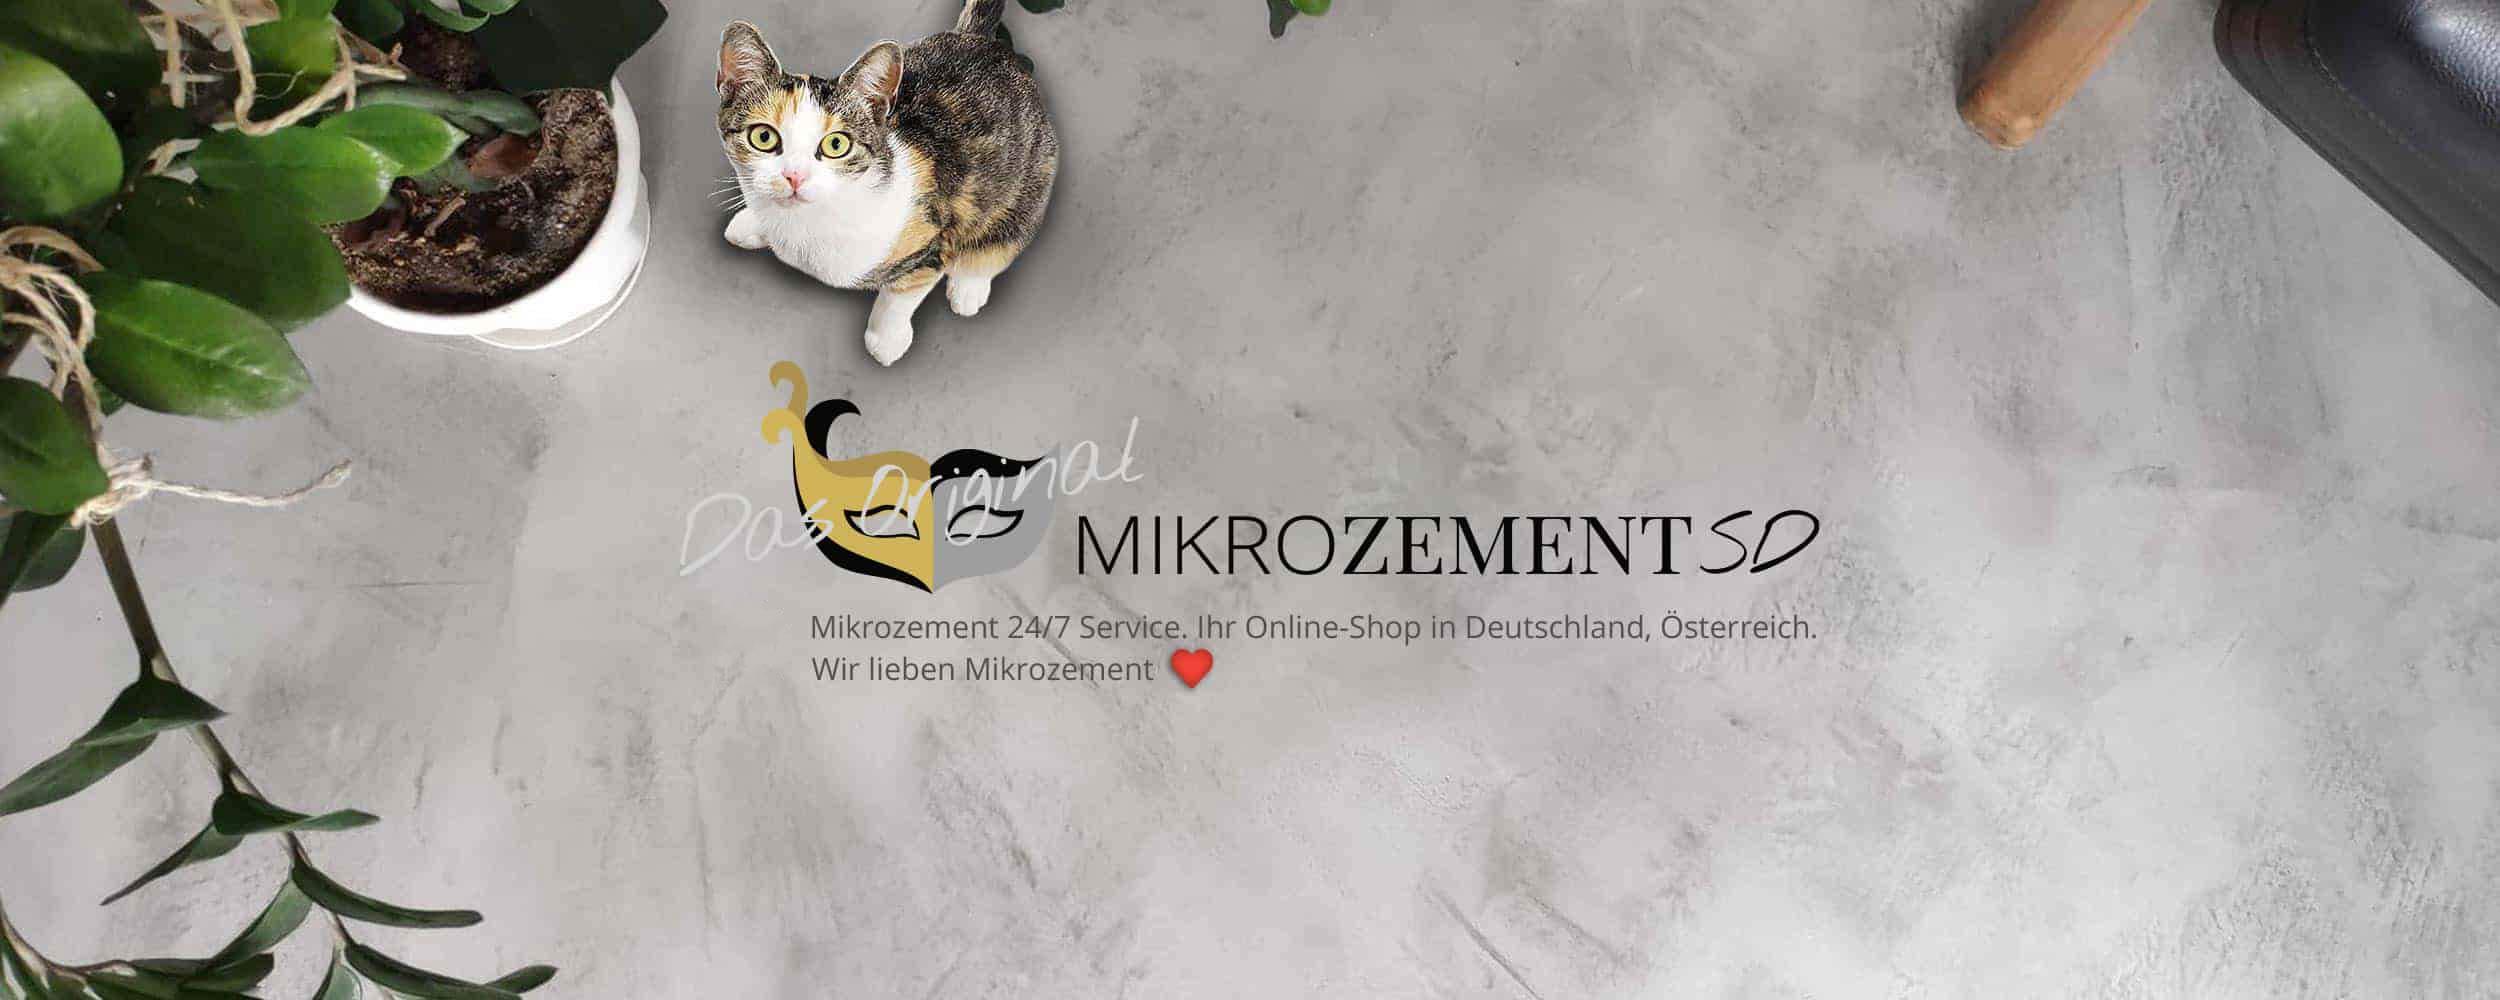 Mikrozement 24 7 Support Badezimmer fugenlos Microzement SD